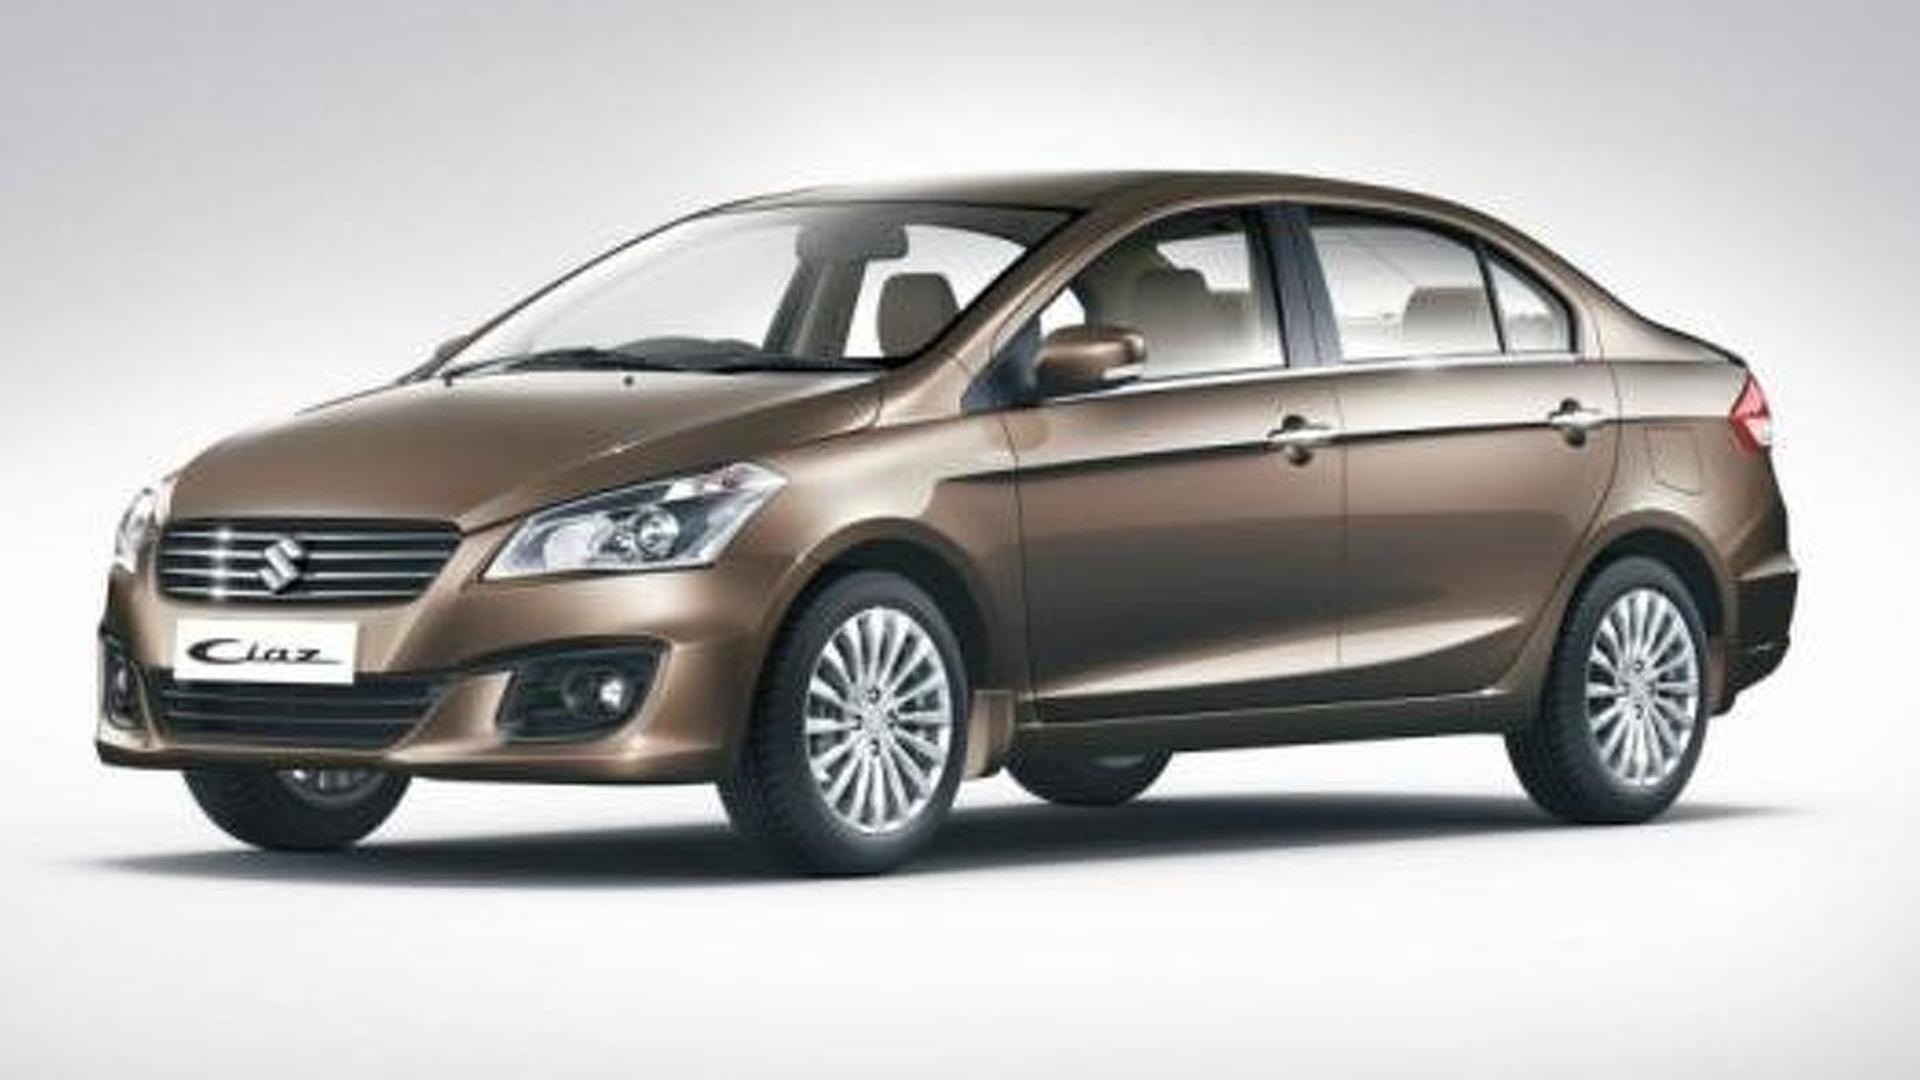 Maruti Suzuki Ciaz officially revealed in India